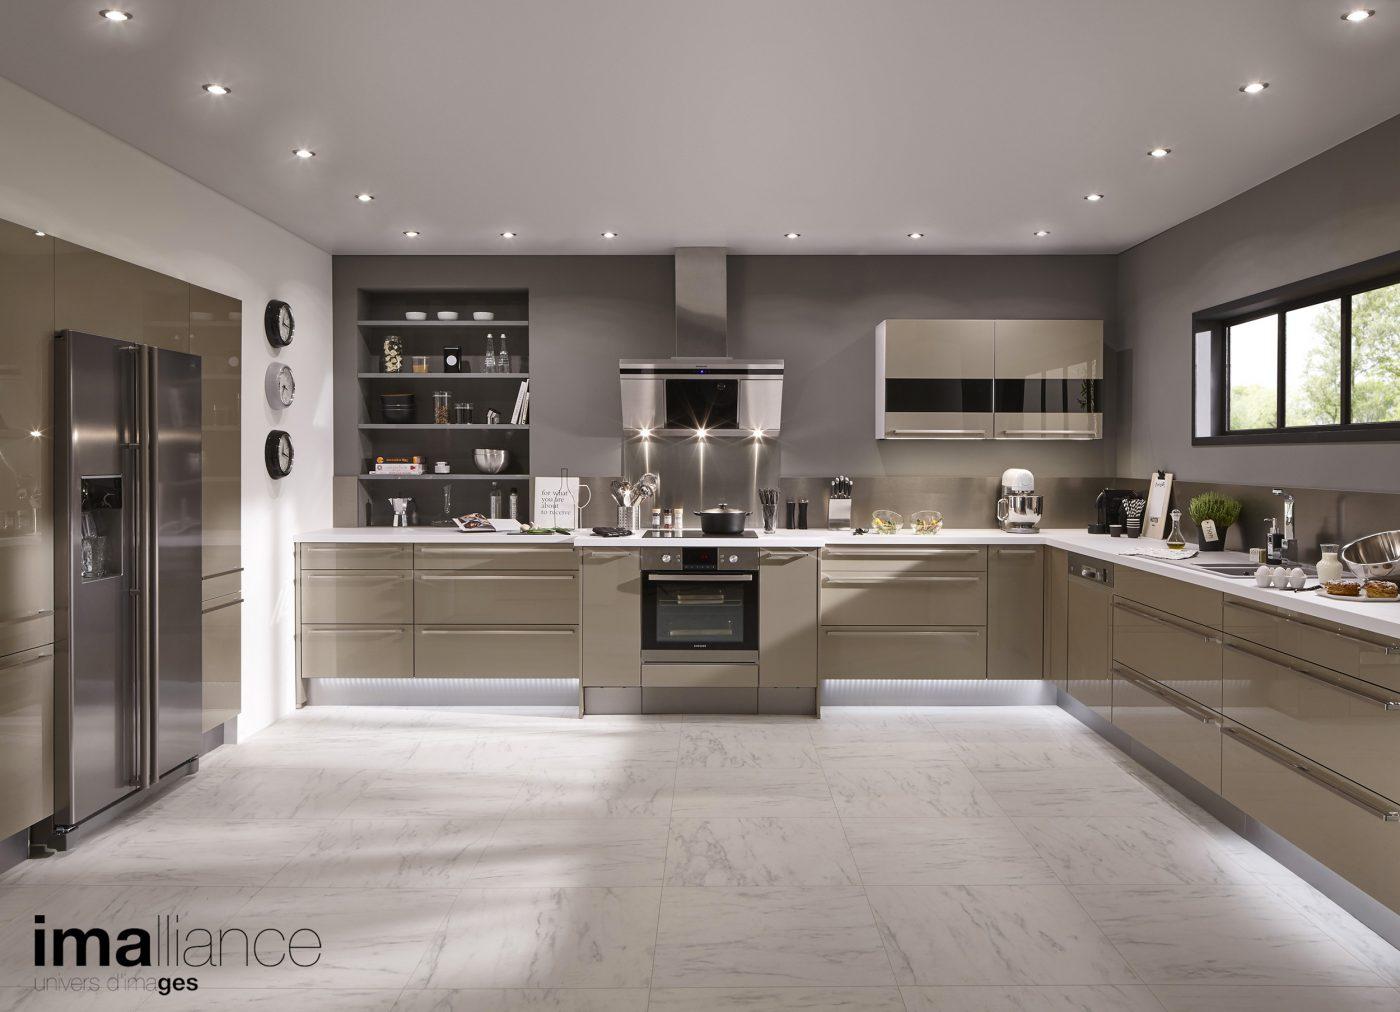 conforama cuisines quipes stunning wohnzimmer de cuisine. Black Bedroom Furniture Sets. Home Design Ideas